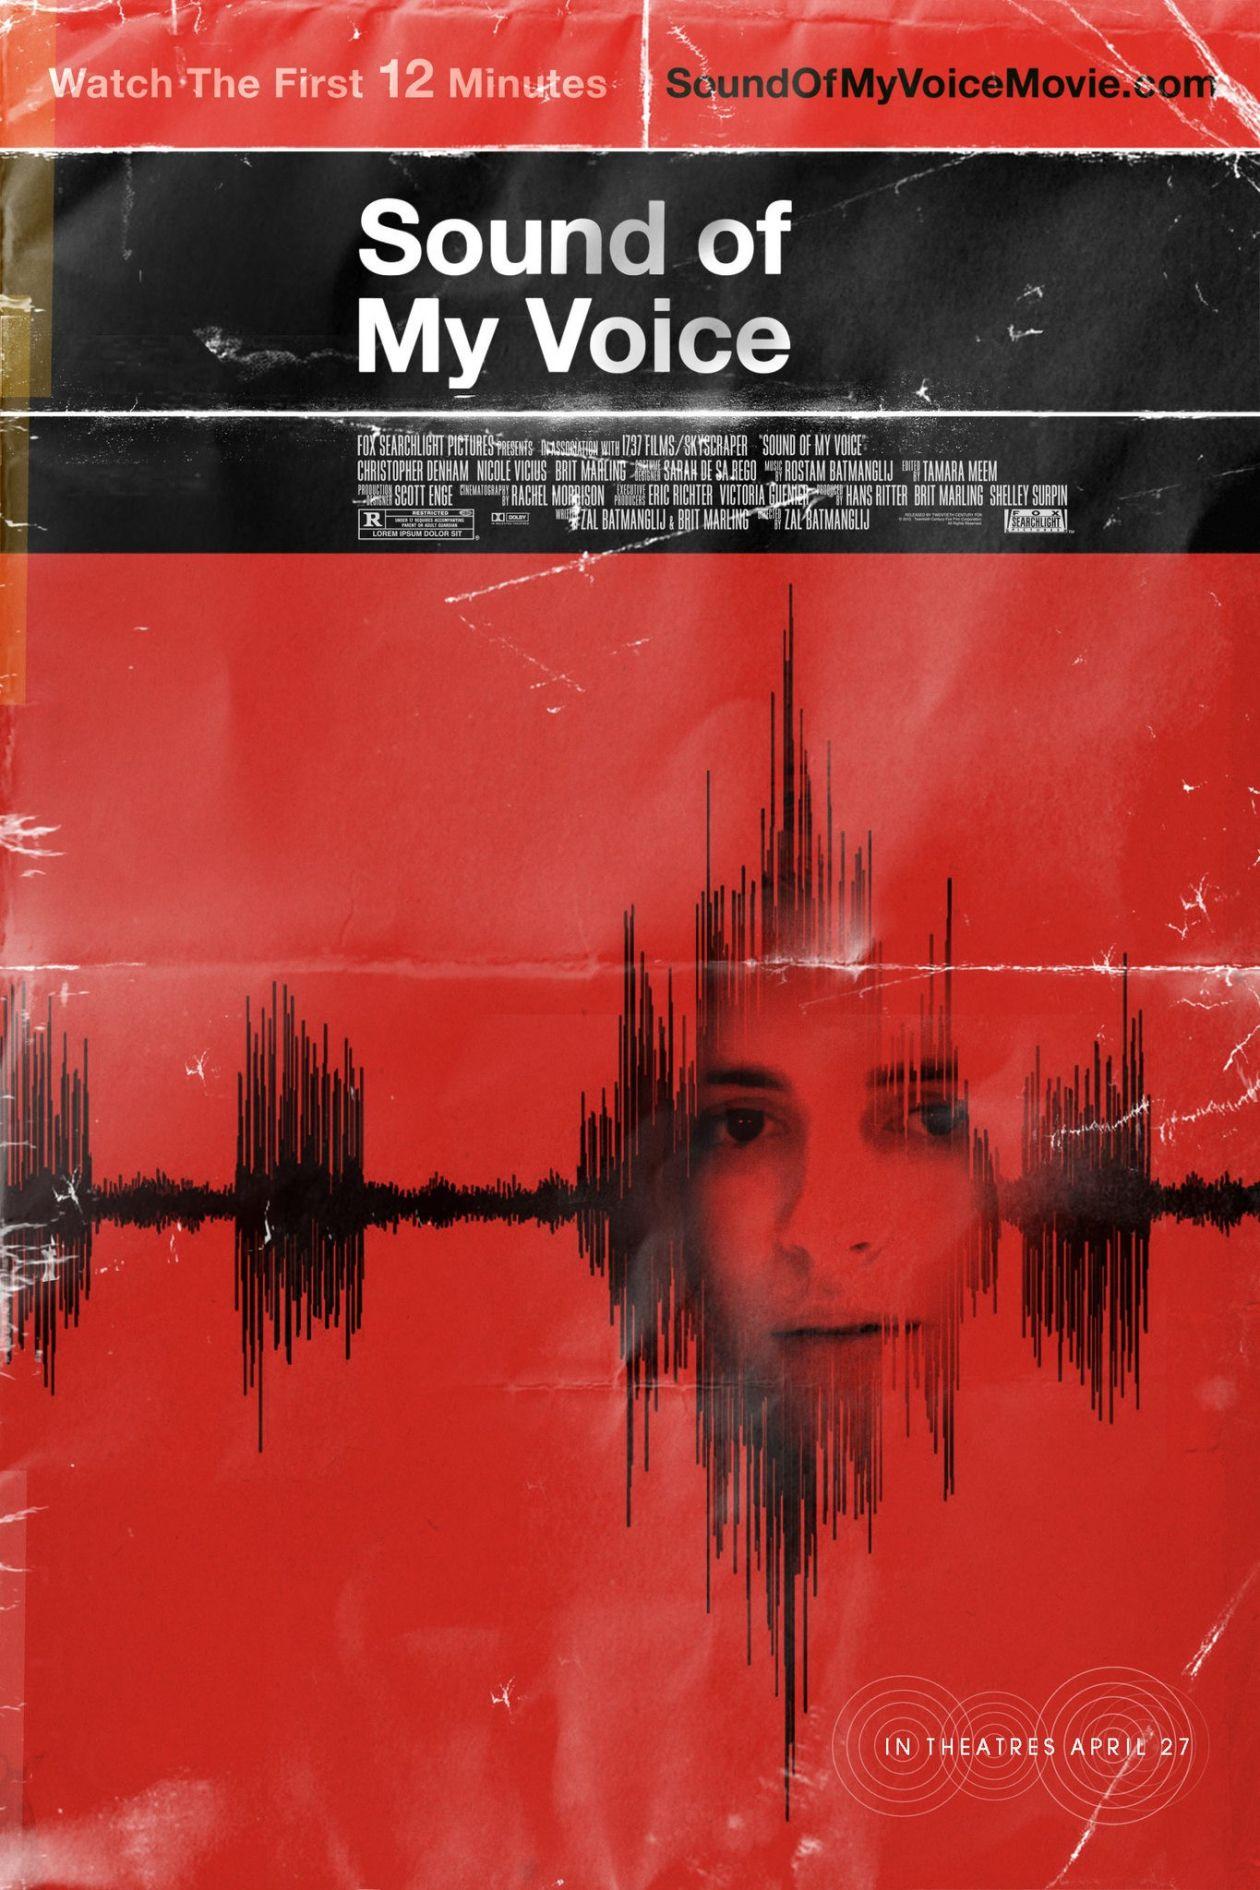 Brit Marling actress | Sound of my voice / Zal Batmanglij 2012 Movie Poster / Affiche film